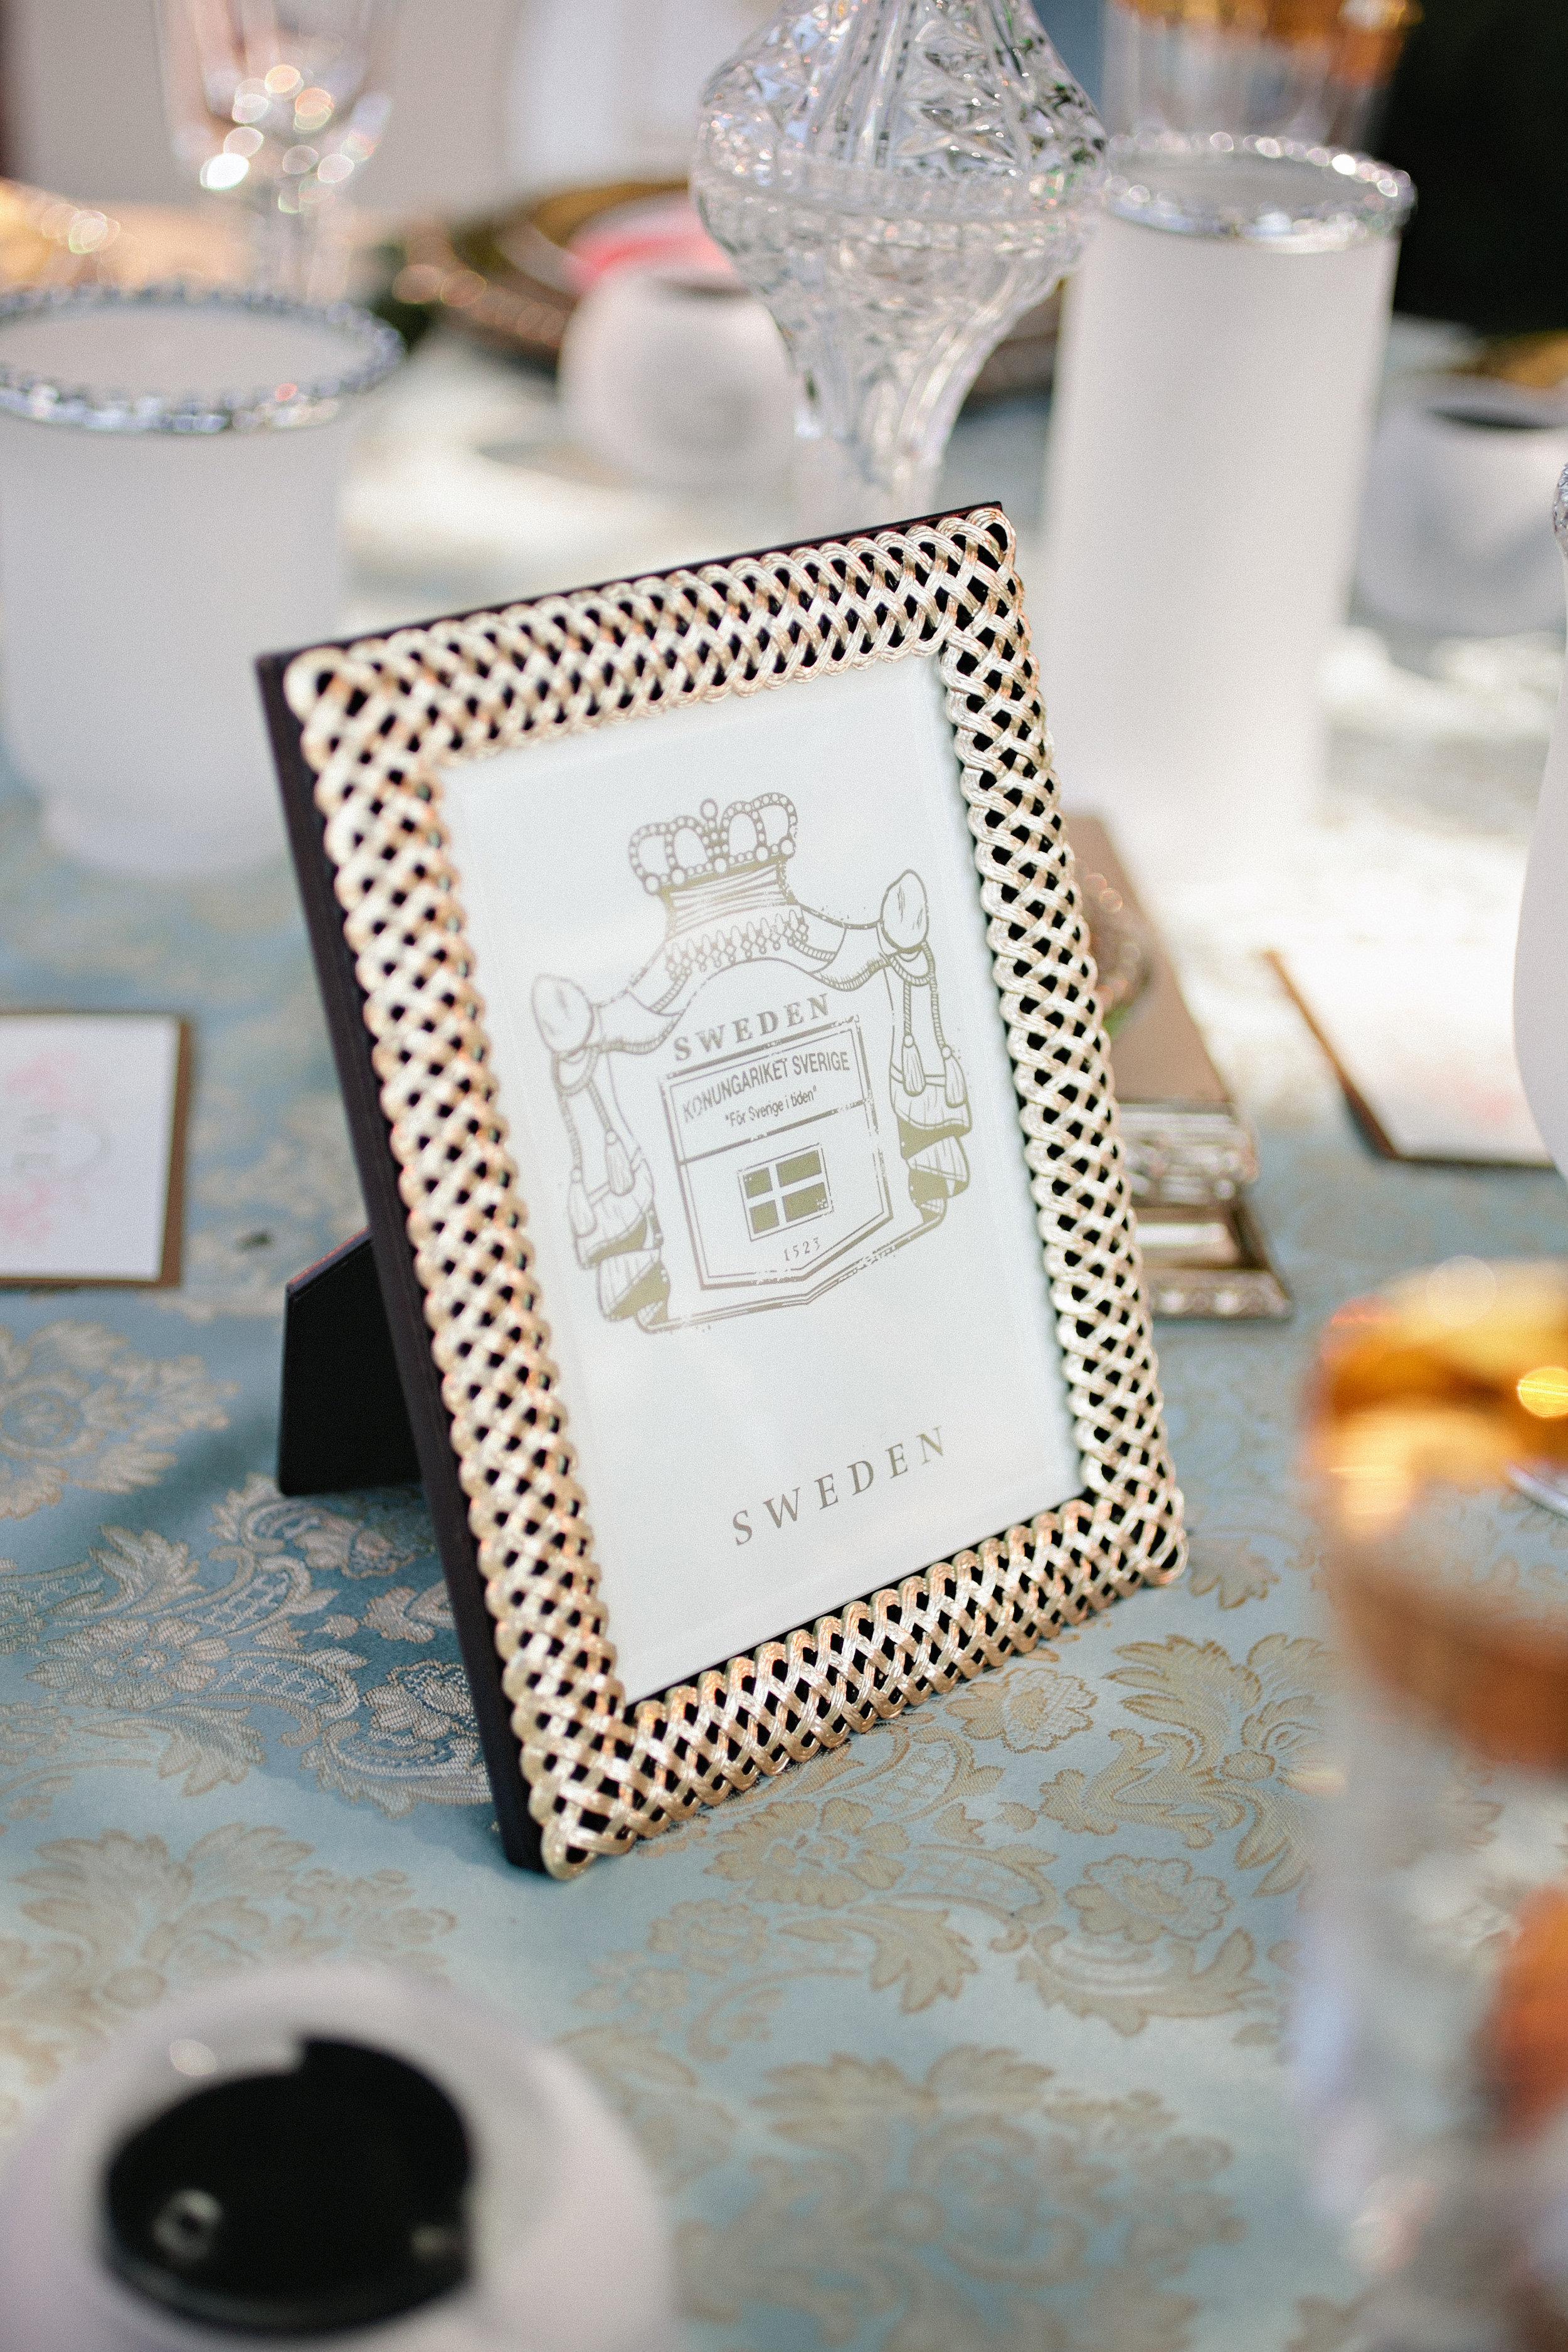 9086_linda_vu_wedding-1616977254-O.jpg